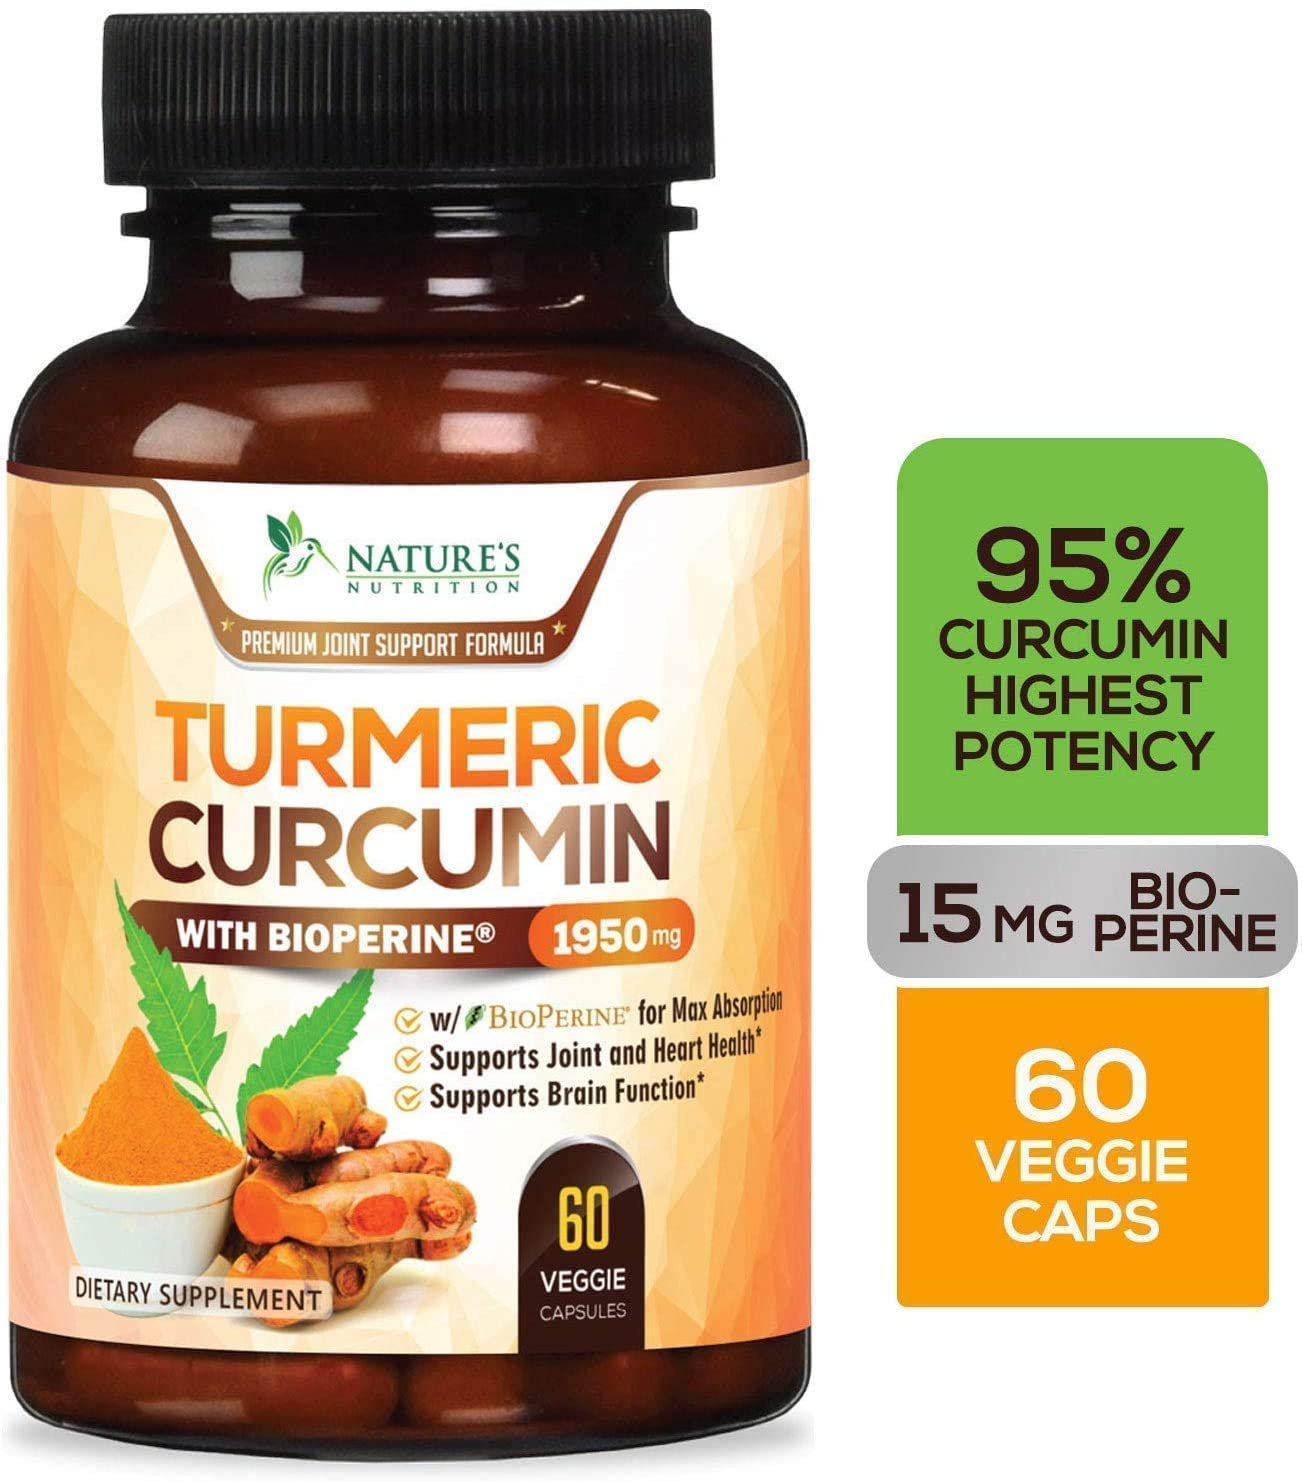 Tumeric curcumin highest potency